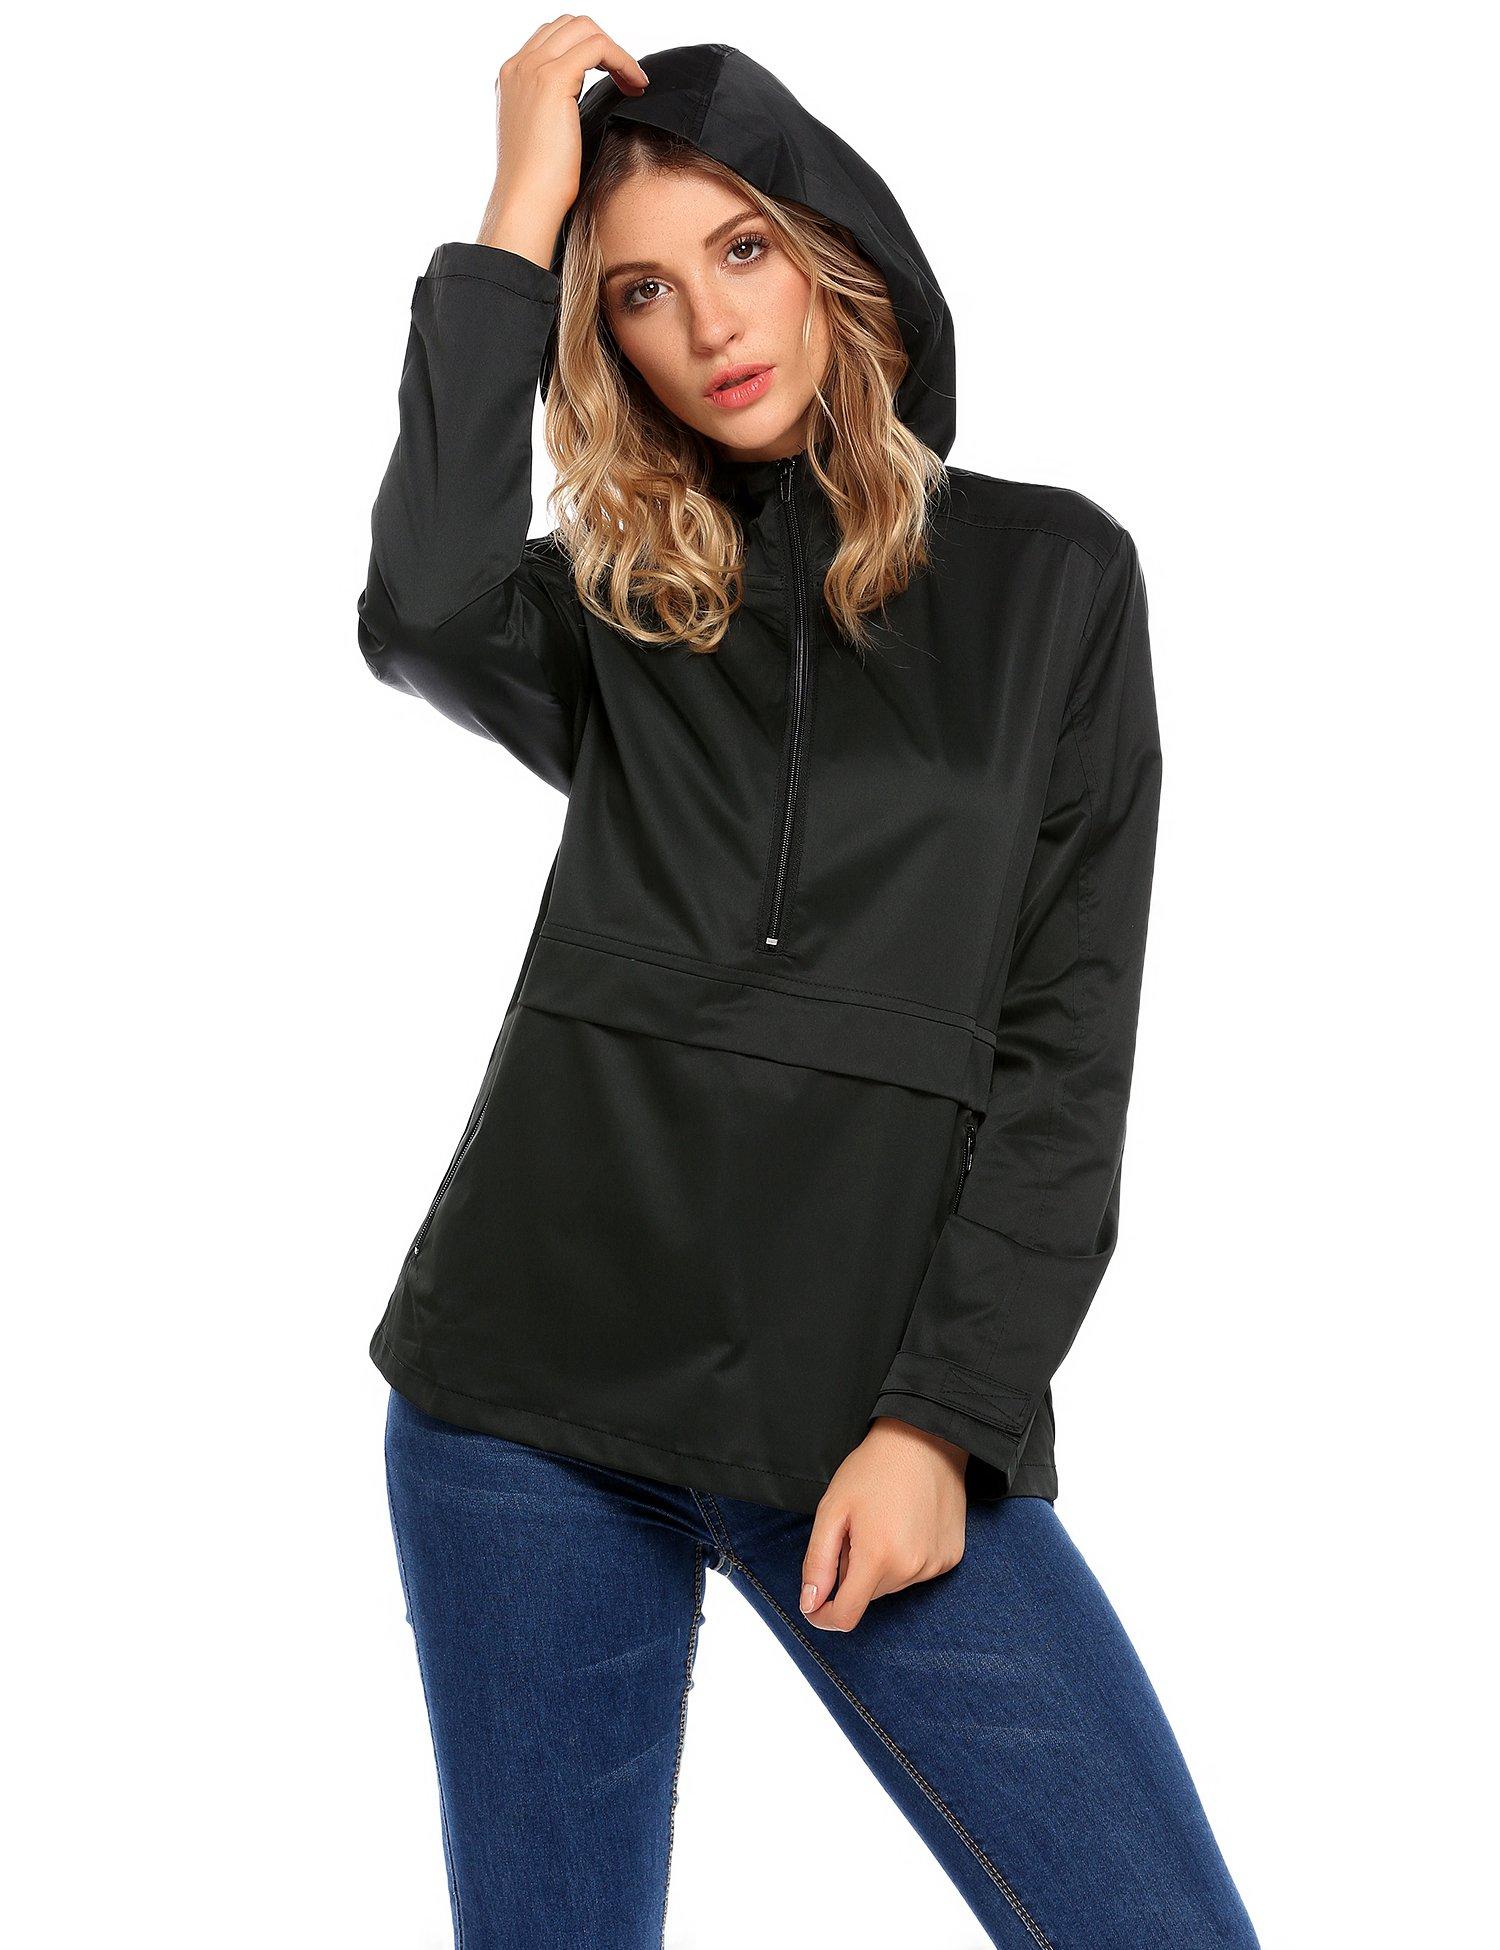 SummerRio Women's Waterproof Venture Resolve Softshell Rainwear Jacket (Black,Medium) by SummerRio (Image #4)